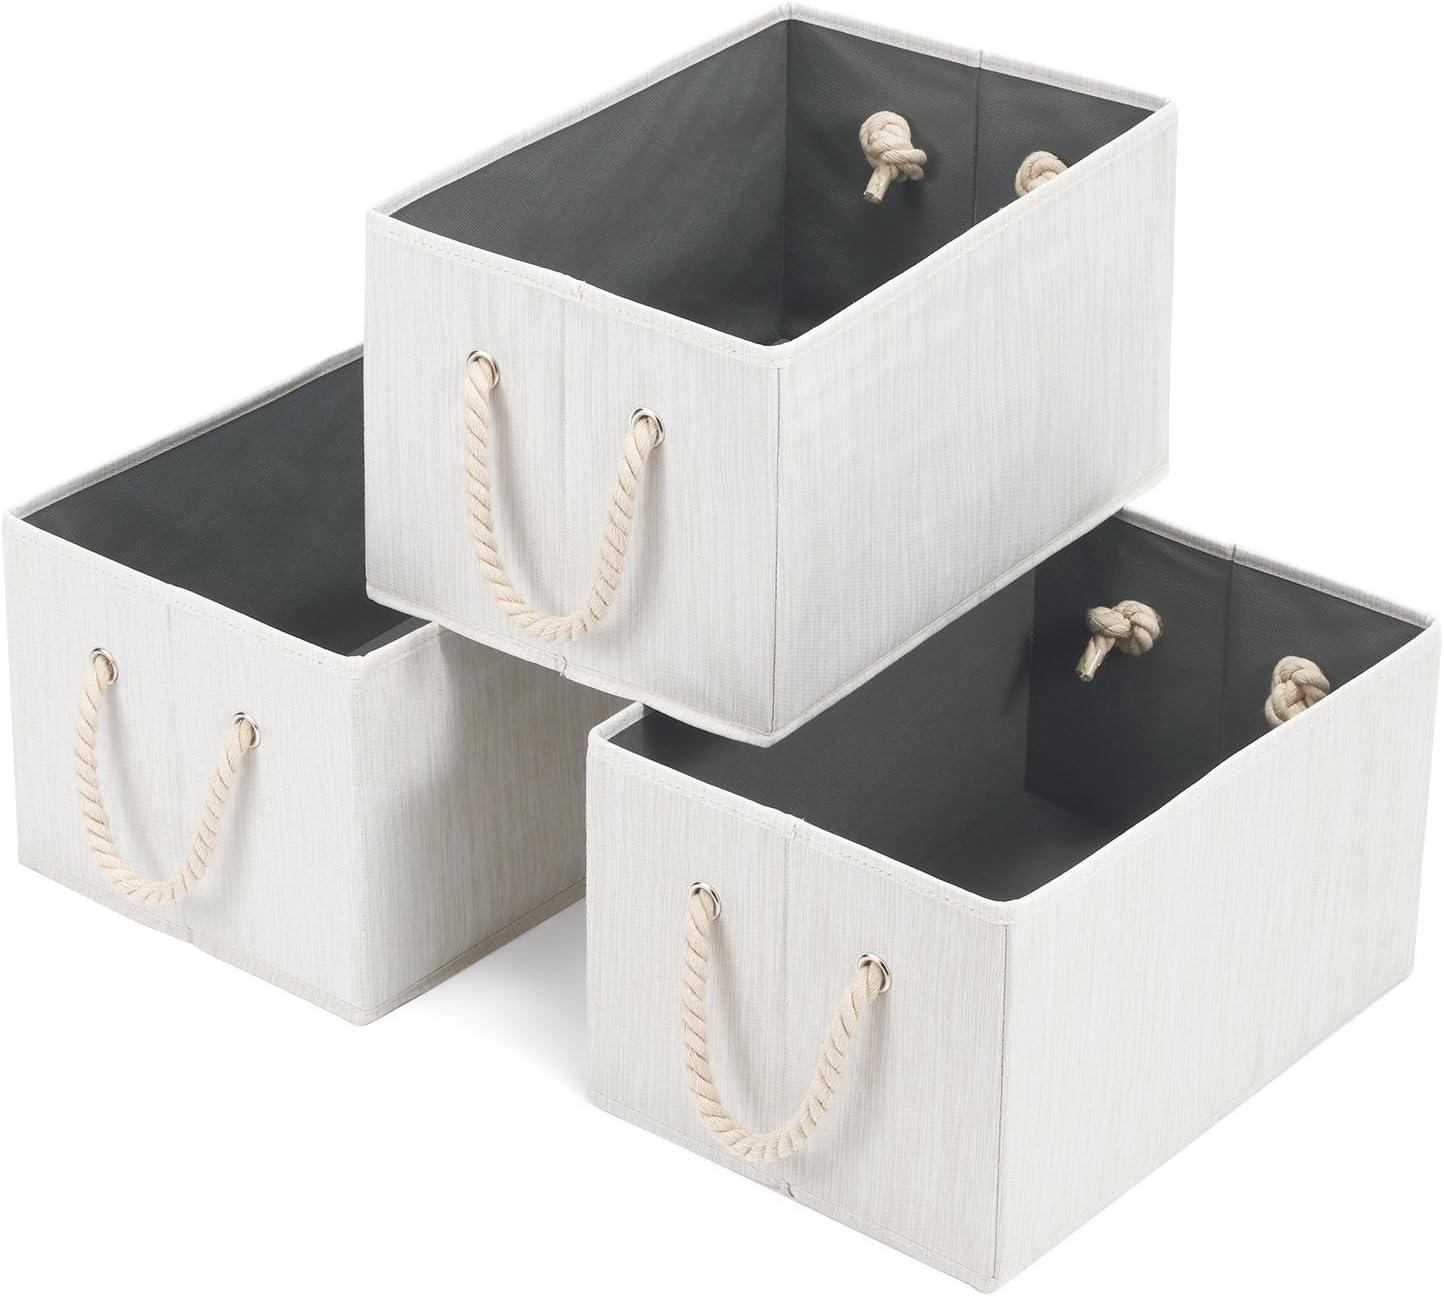 Magicfly Foldable Storage Cubes, Polyester Cloth Bins Fabric Basket Organizer,14.4 X 10 X 8.3 inch,Beige, Pack of 3